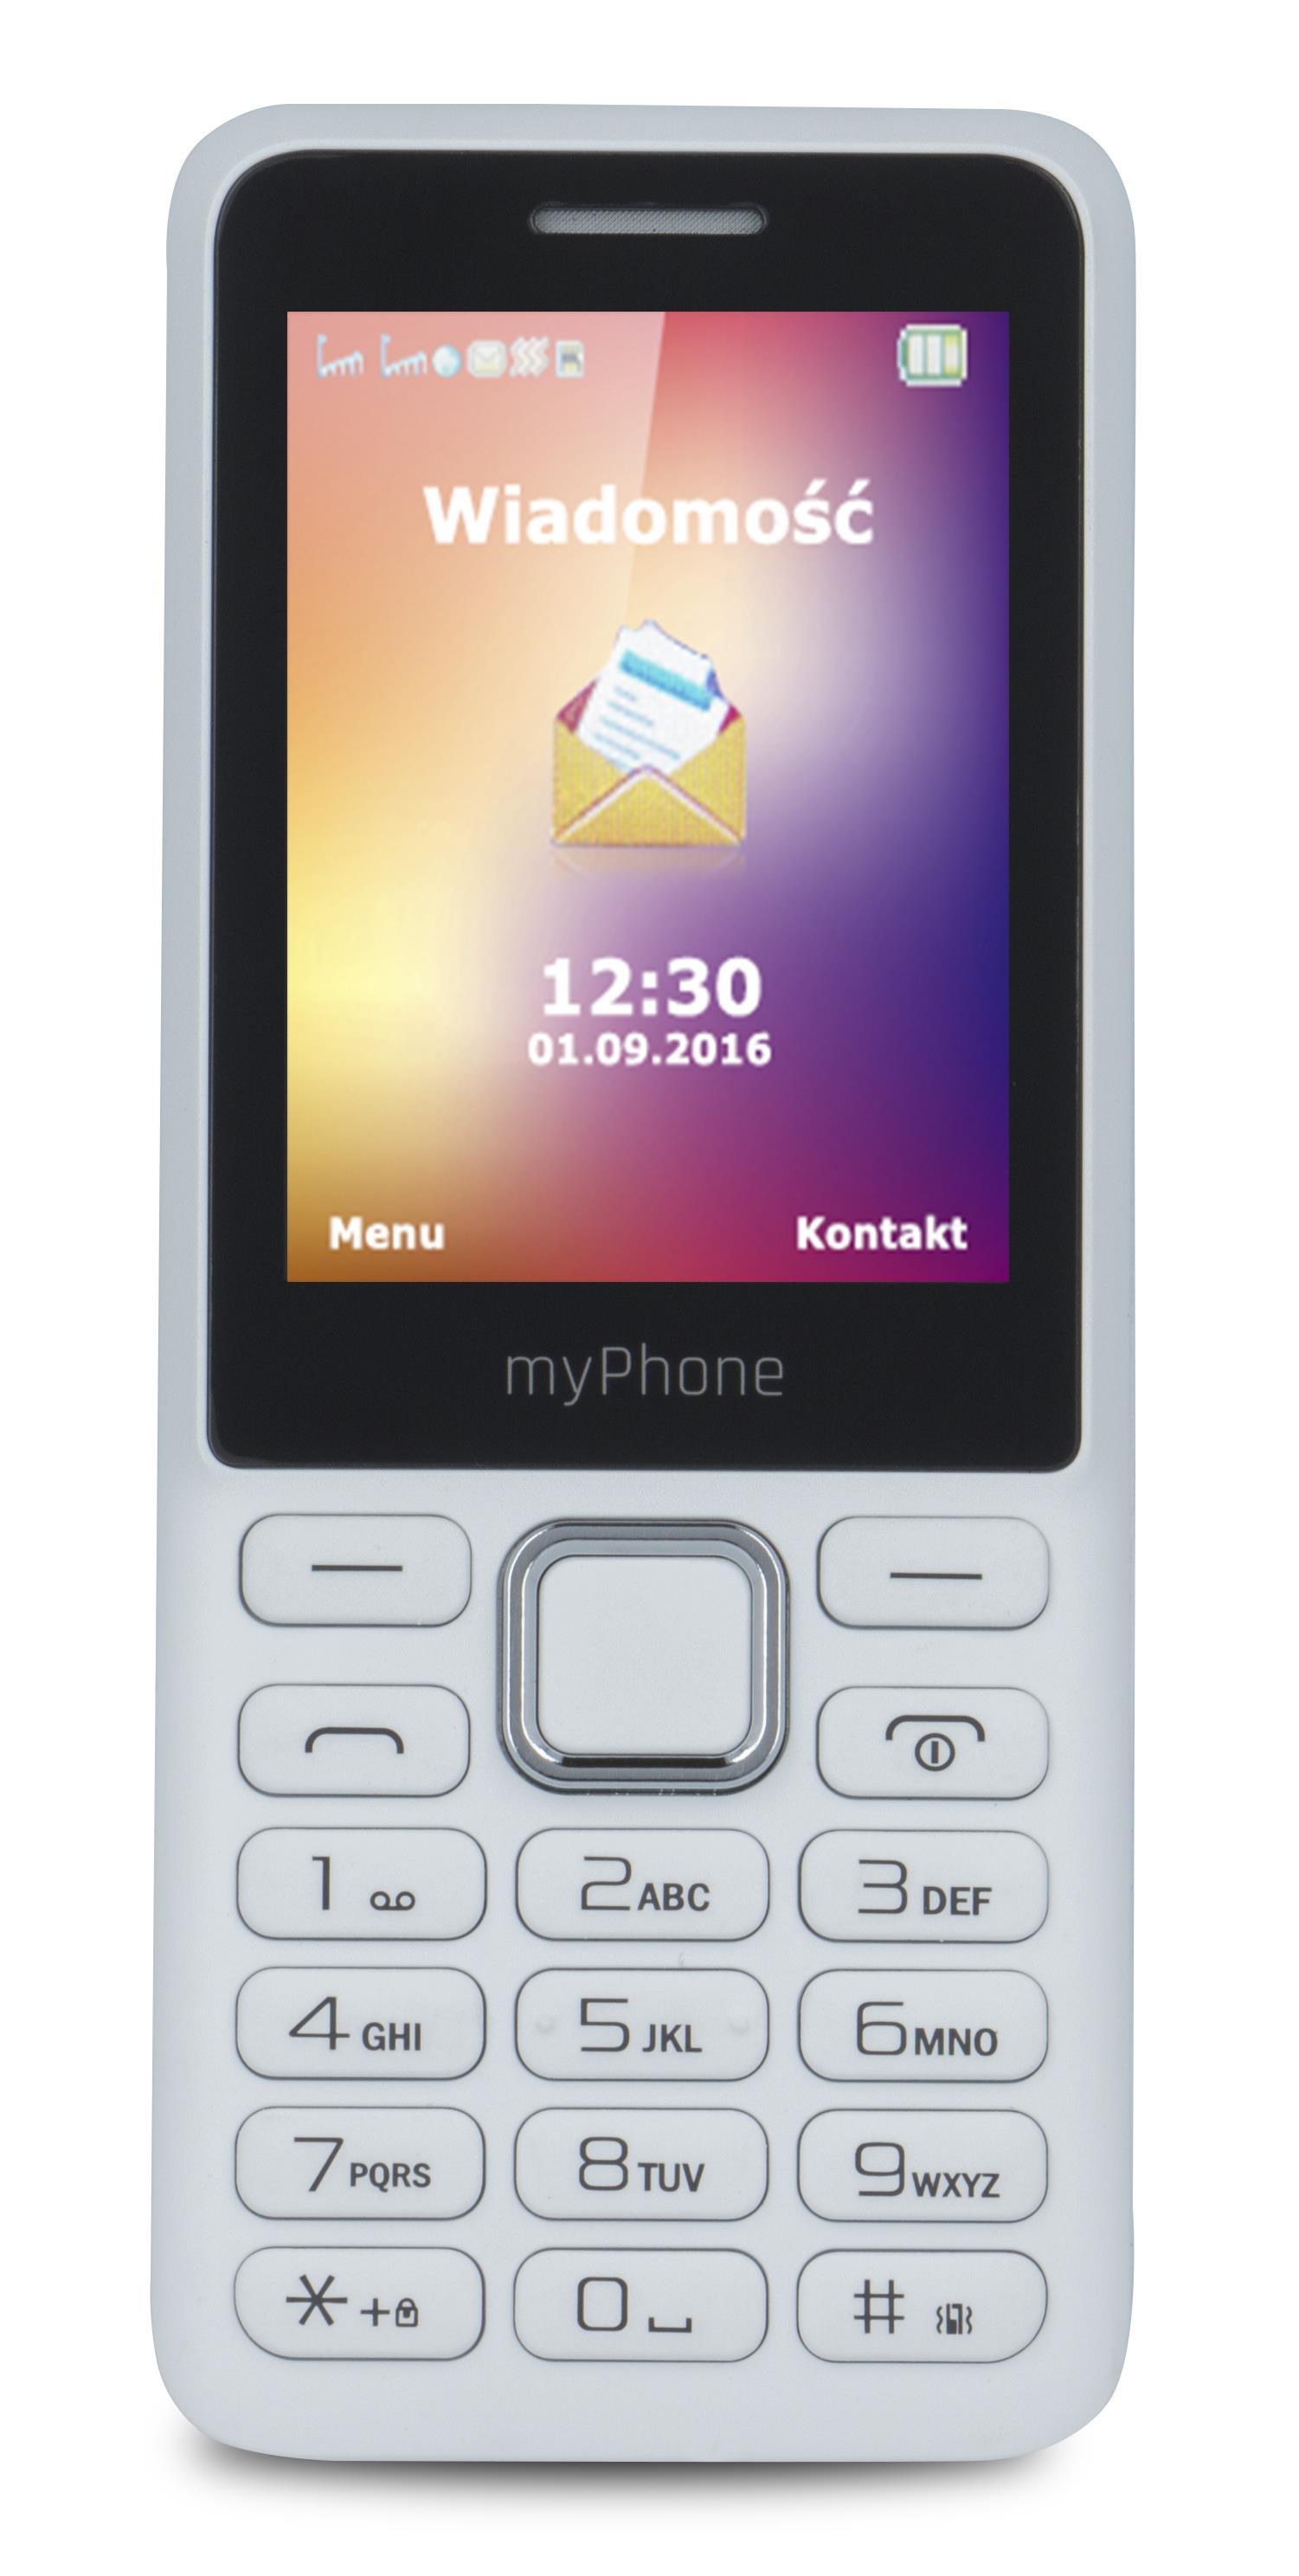 TELEFON DUAL SIM myPhone 6310 BÍLÝ